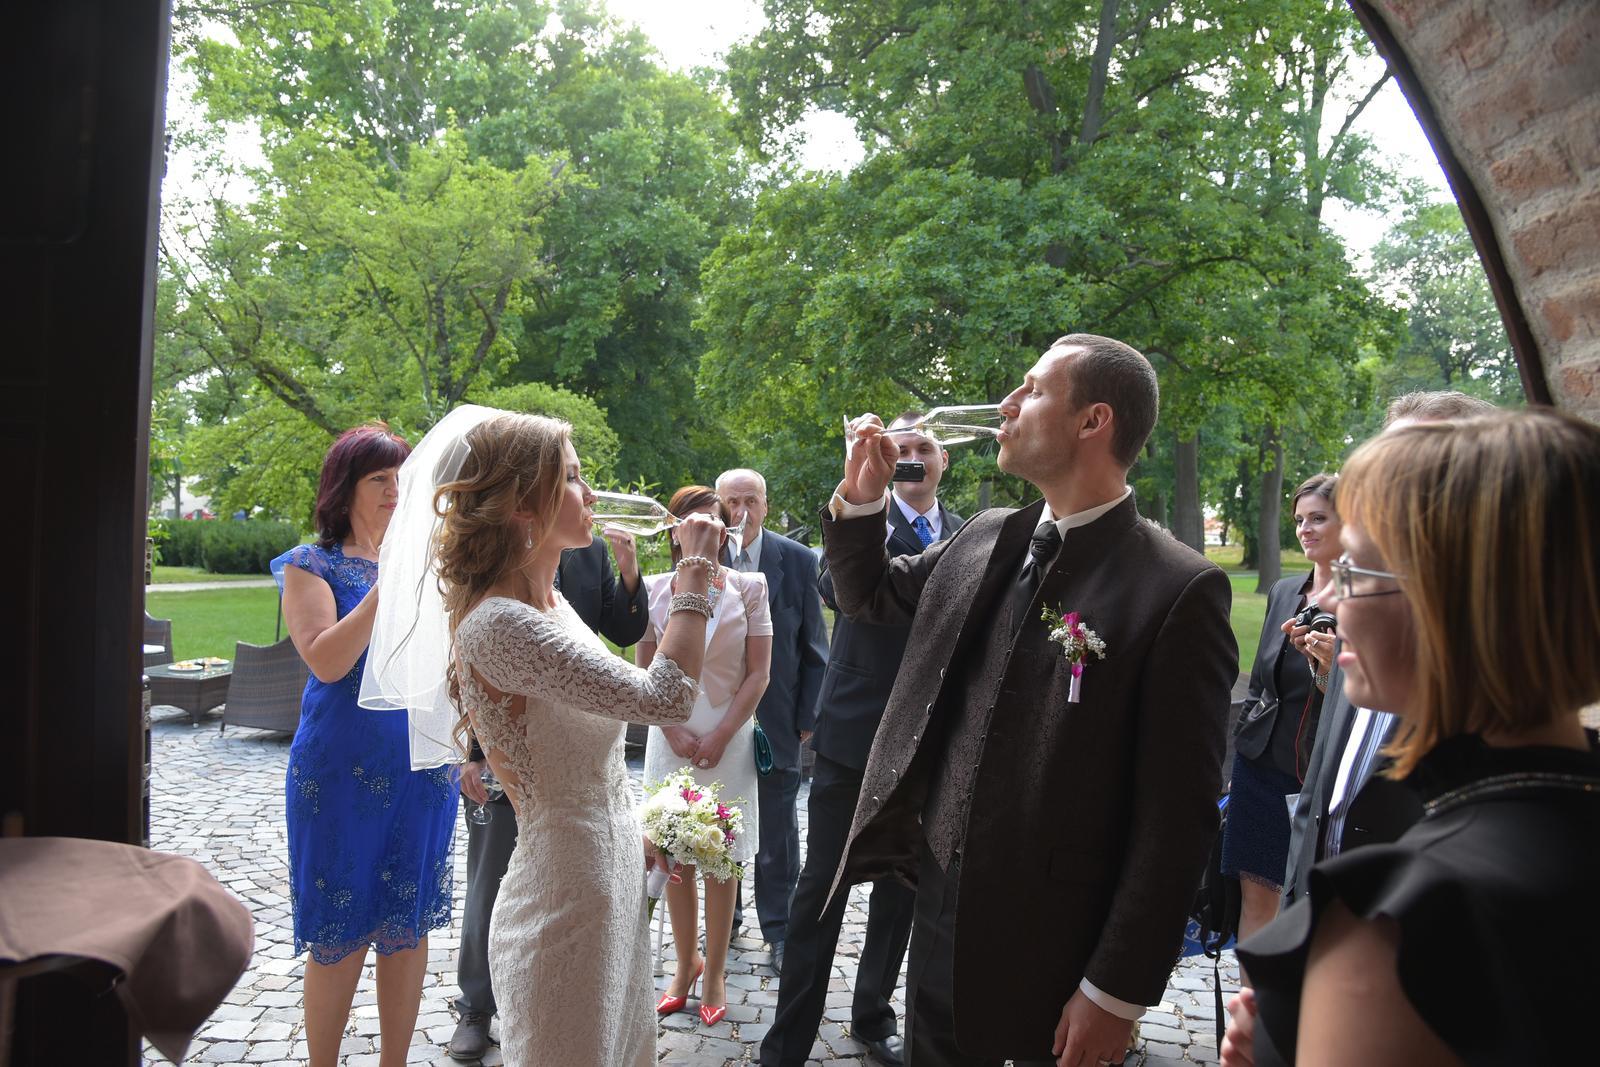 Marijana{{_AND_}}Silvester - Napravo uzasny clovek-pani Natalia Labudova, manazerka Oponickeho kastiela